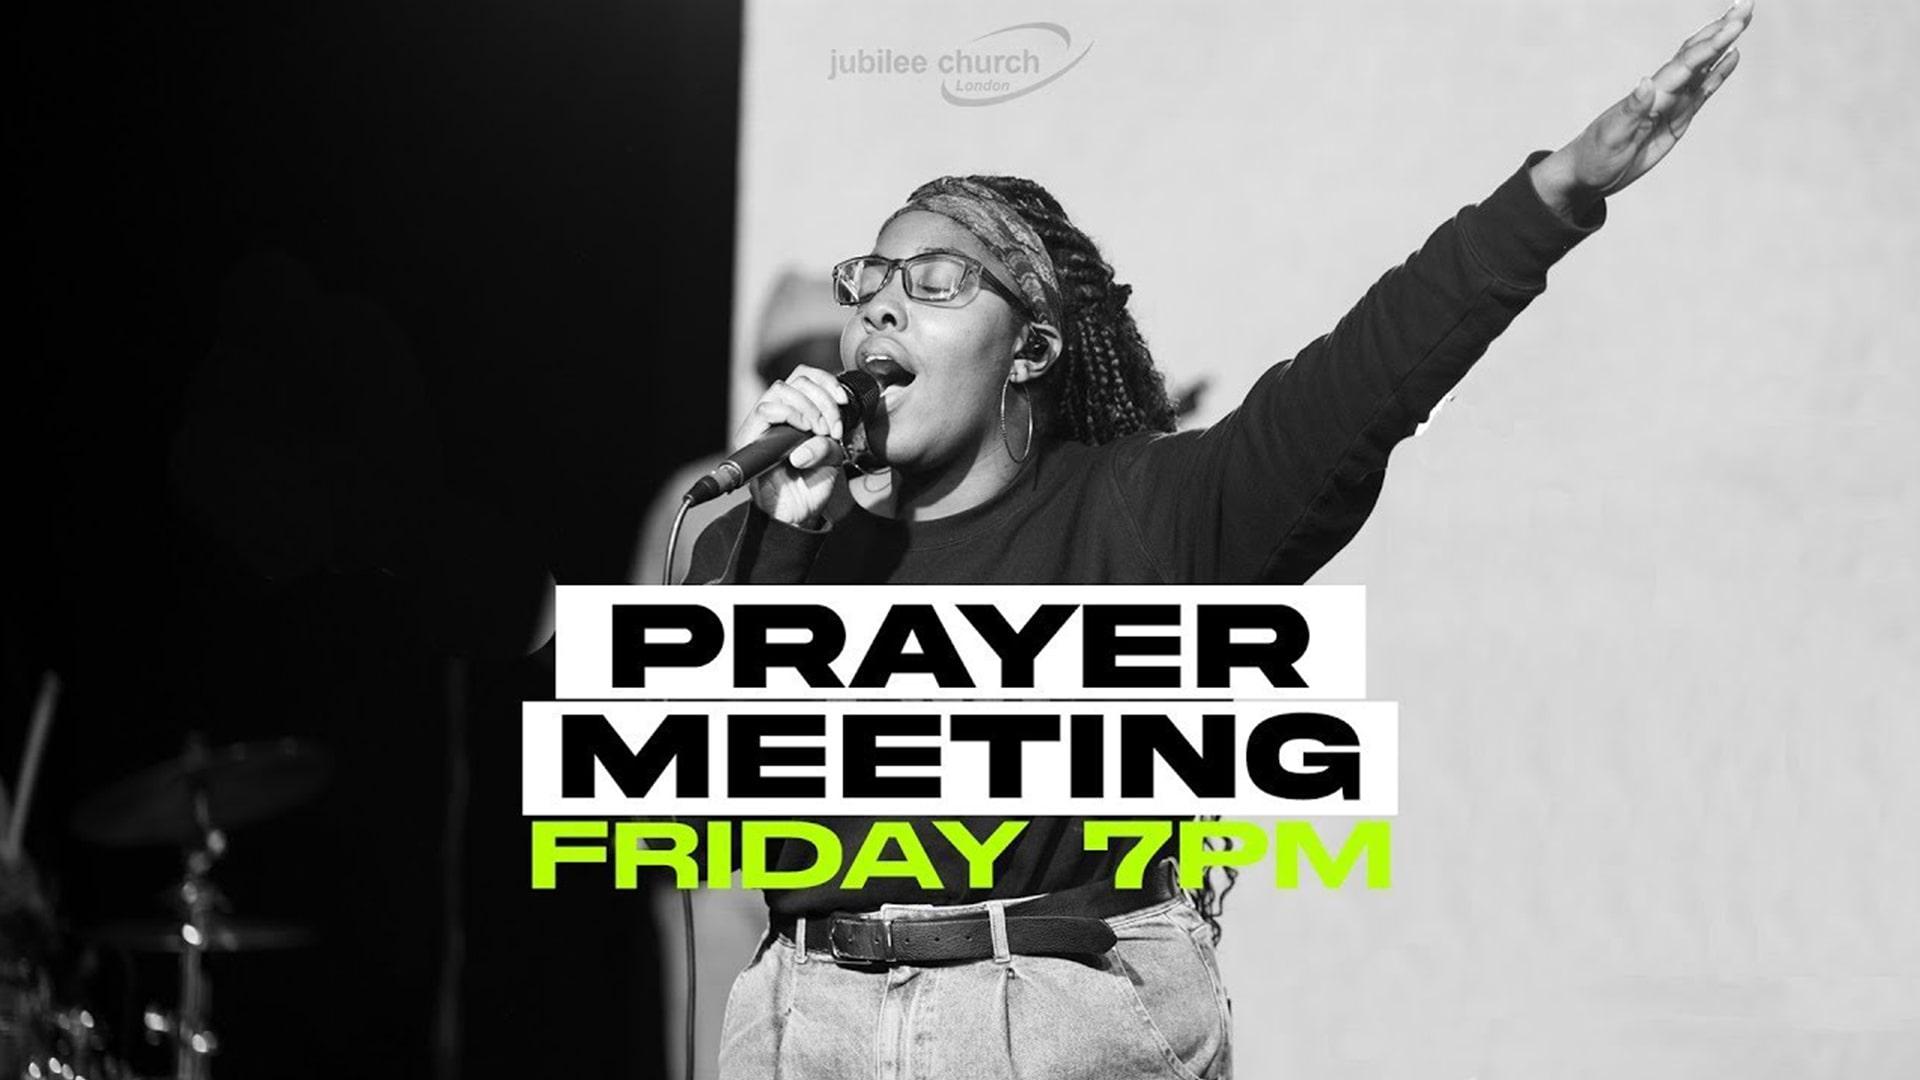 Friday prayer meeting